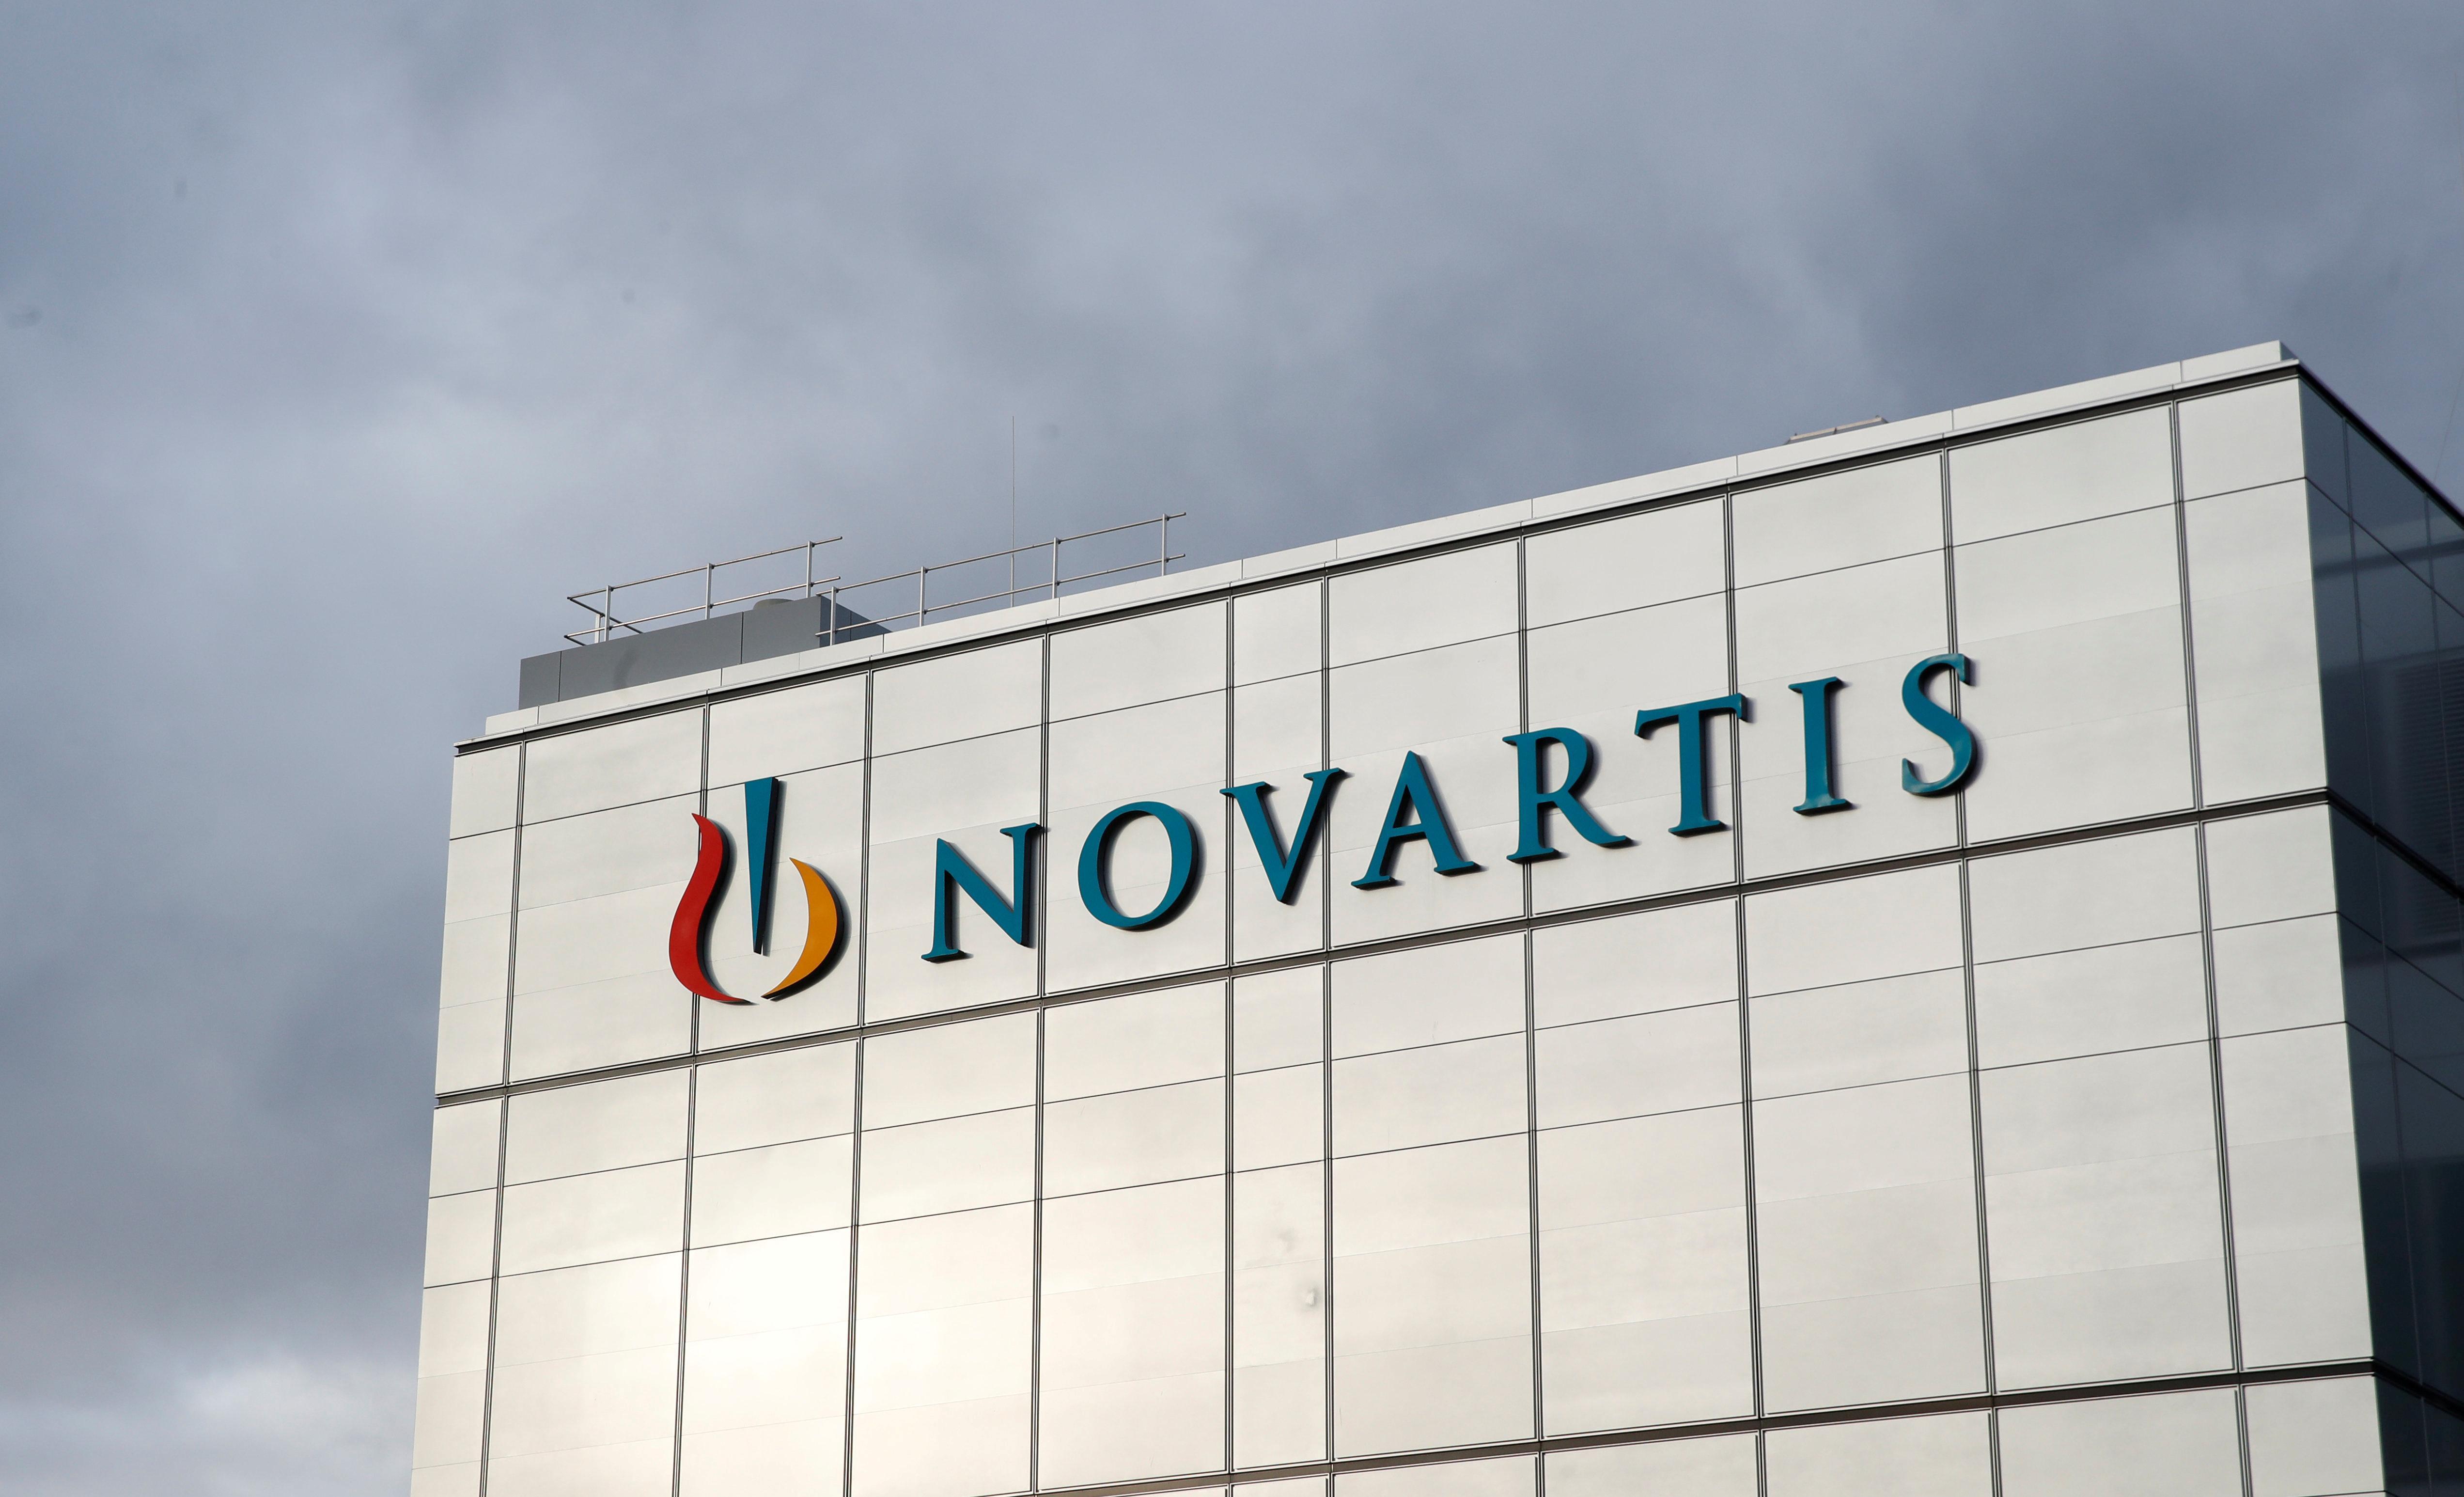 Novartis to speed access to $10 billion heart drug via NHS deal